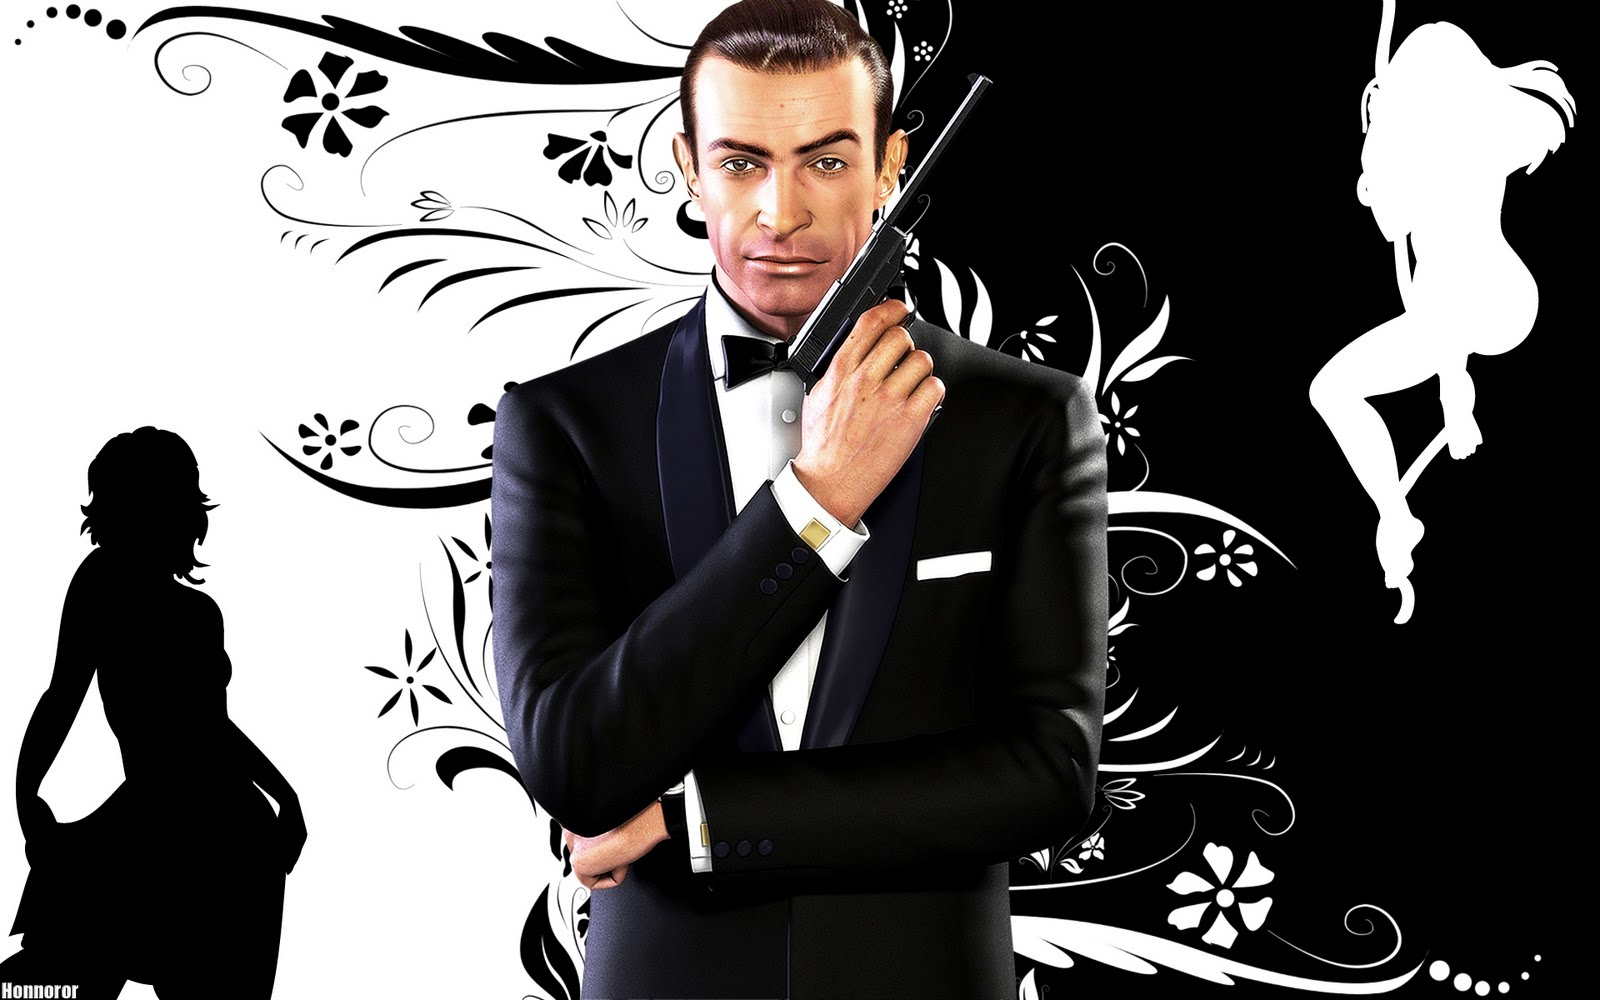 Honnoror Wallpapers: 007 James Bond